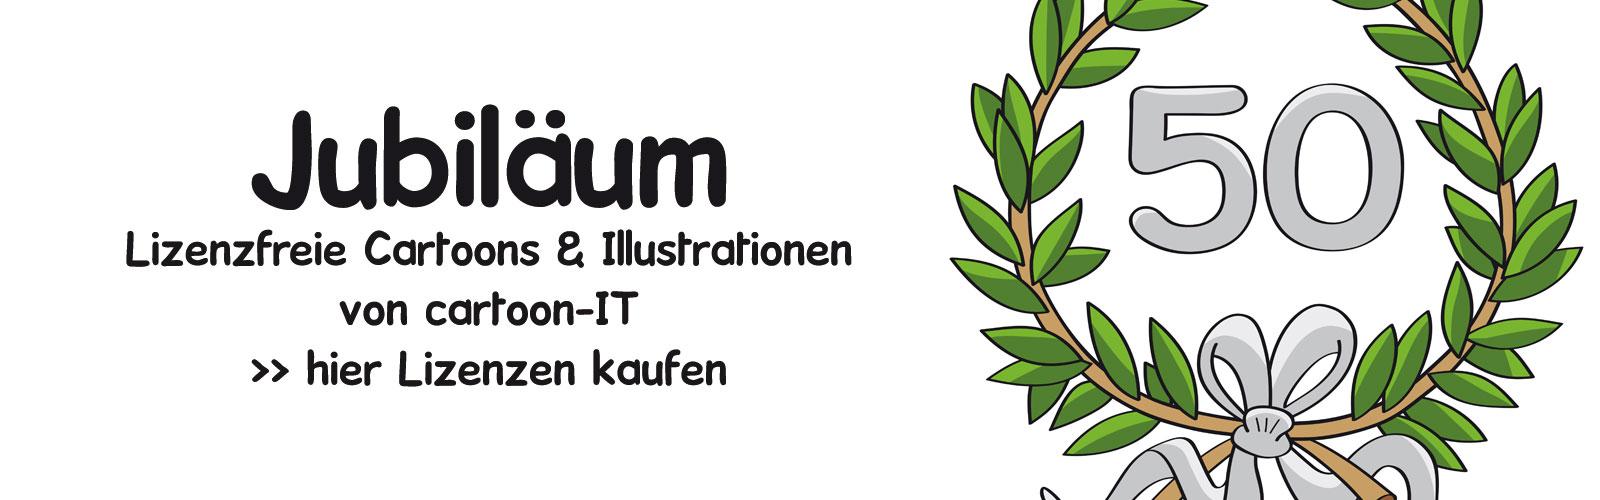 Lizenzfreie Cartoons & Illustrationen JUBILÄUM